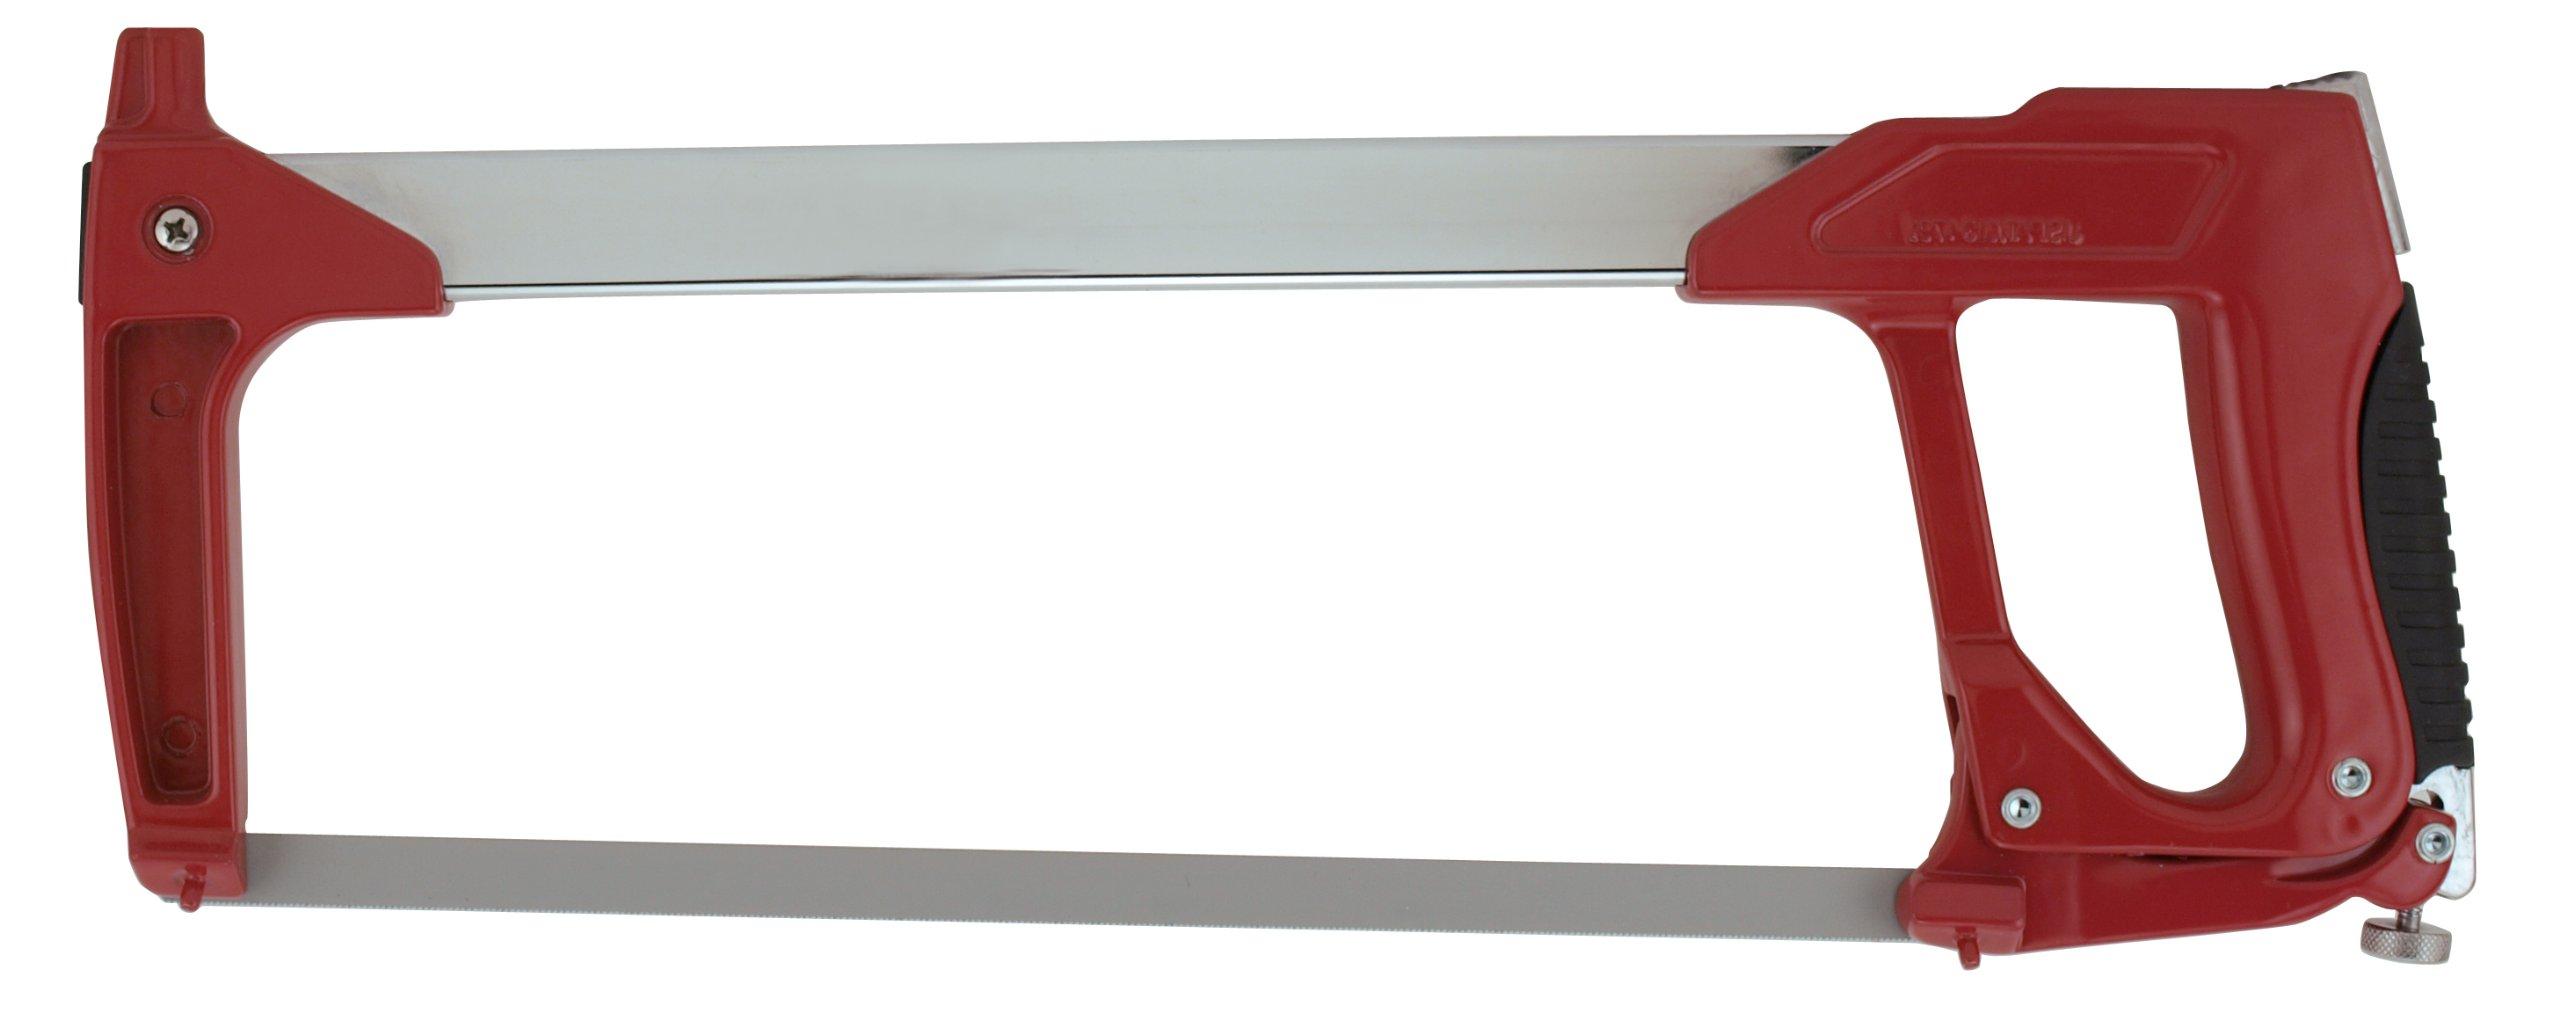 Sheffield 58281 Die Cast Aluminum High Tension Hacksaw